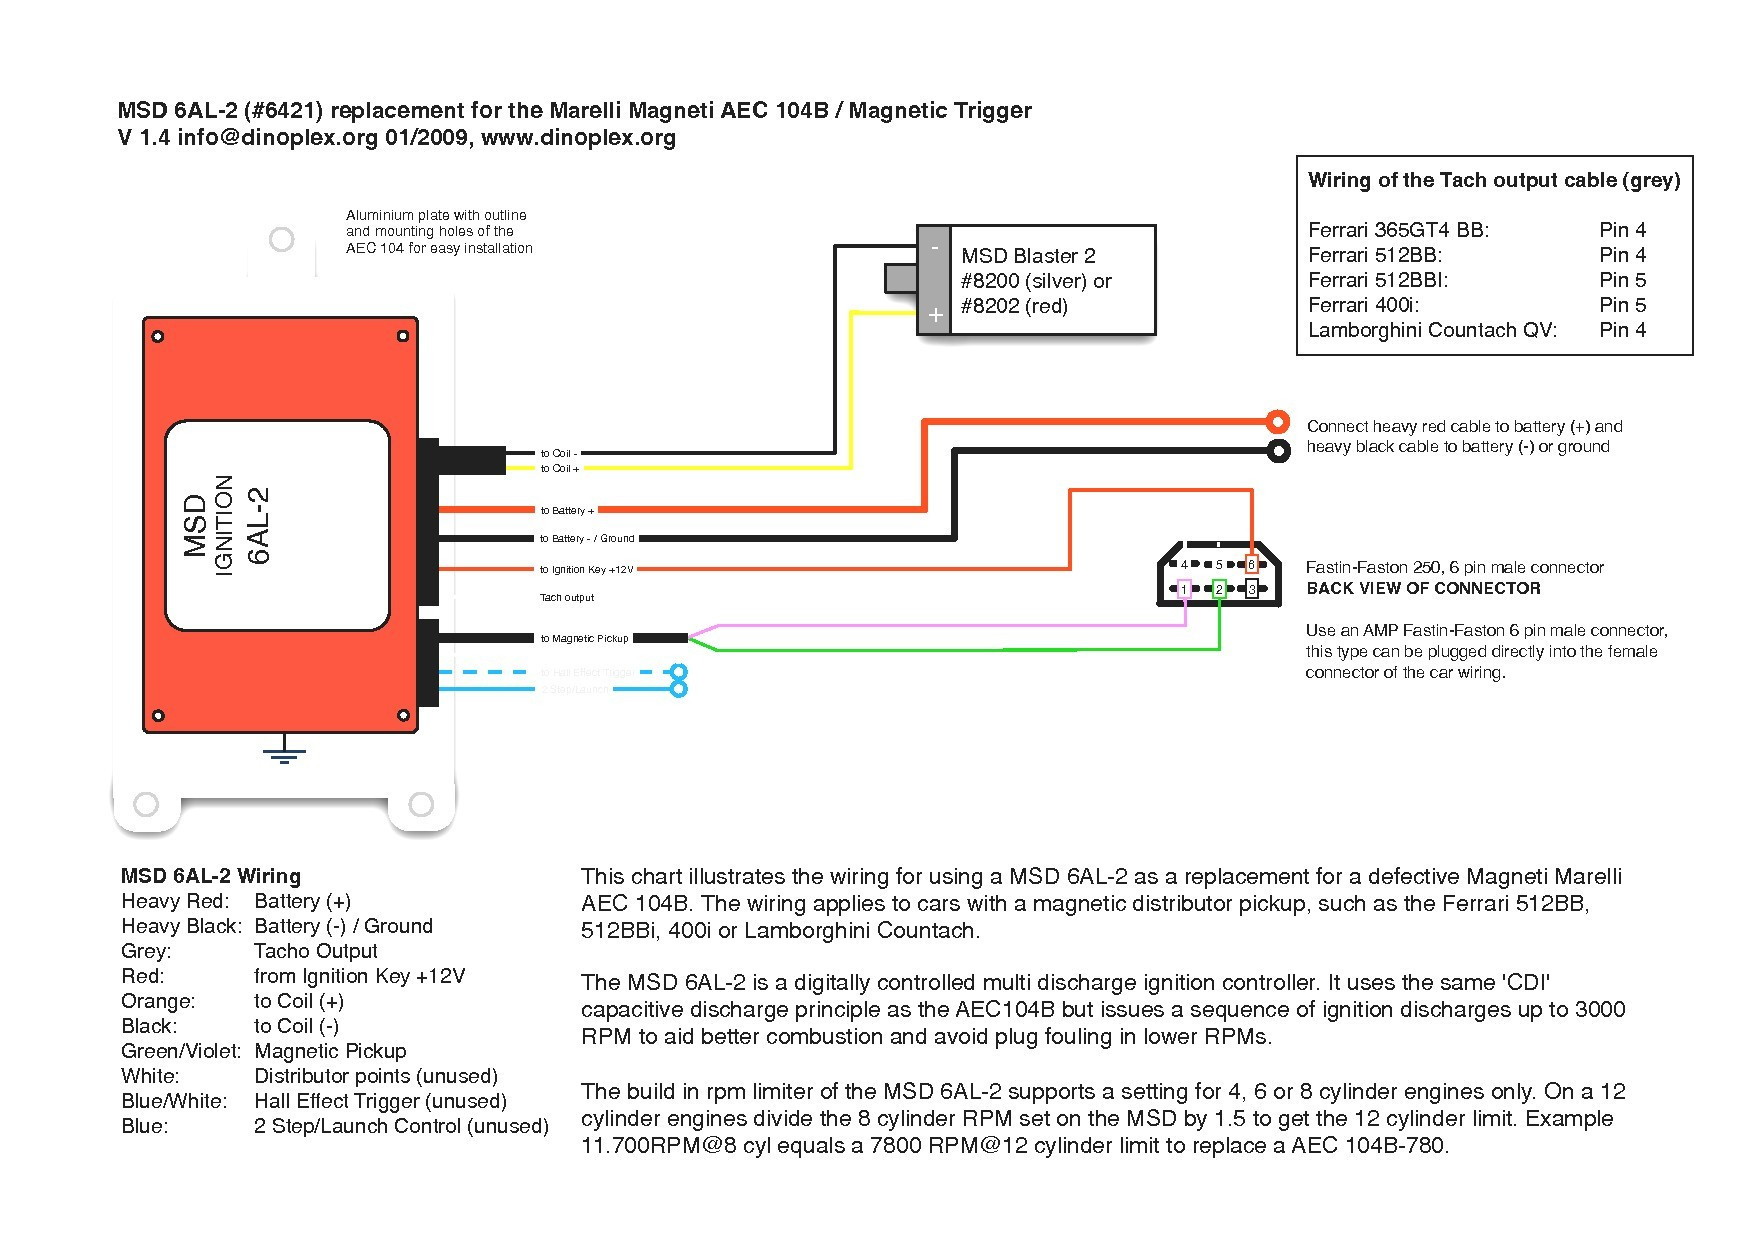 DIAGRAM] Cat 6a Wiring Diagram FULL Version HD Quality Wiring Diagram -  CIRCUIT-DIAGRAM.EMERICGATELIER.FRcircuit-diagram.emericgatelier.fr